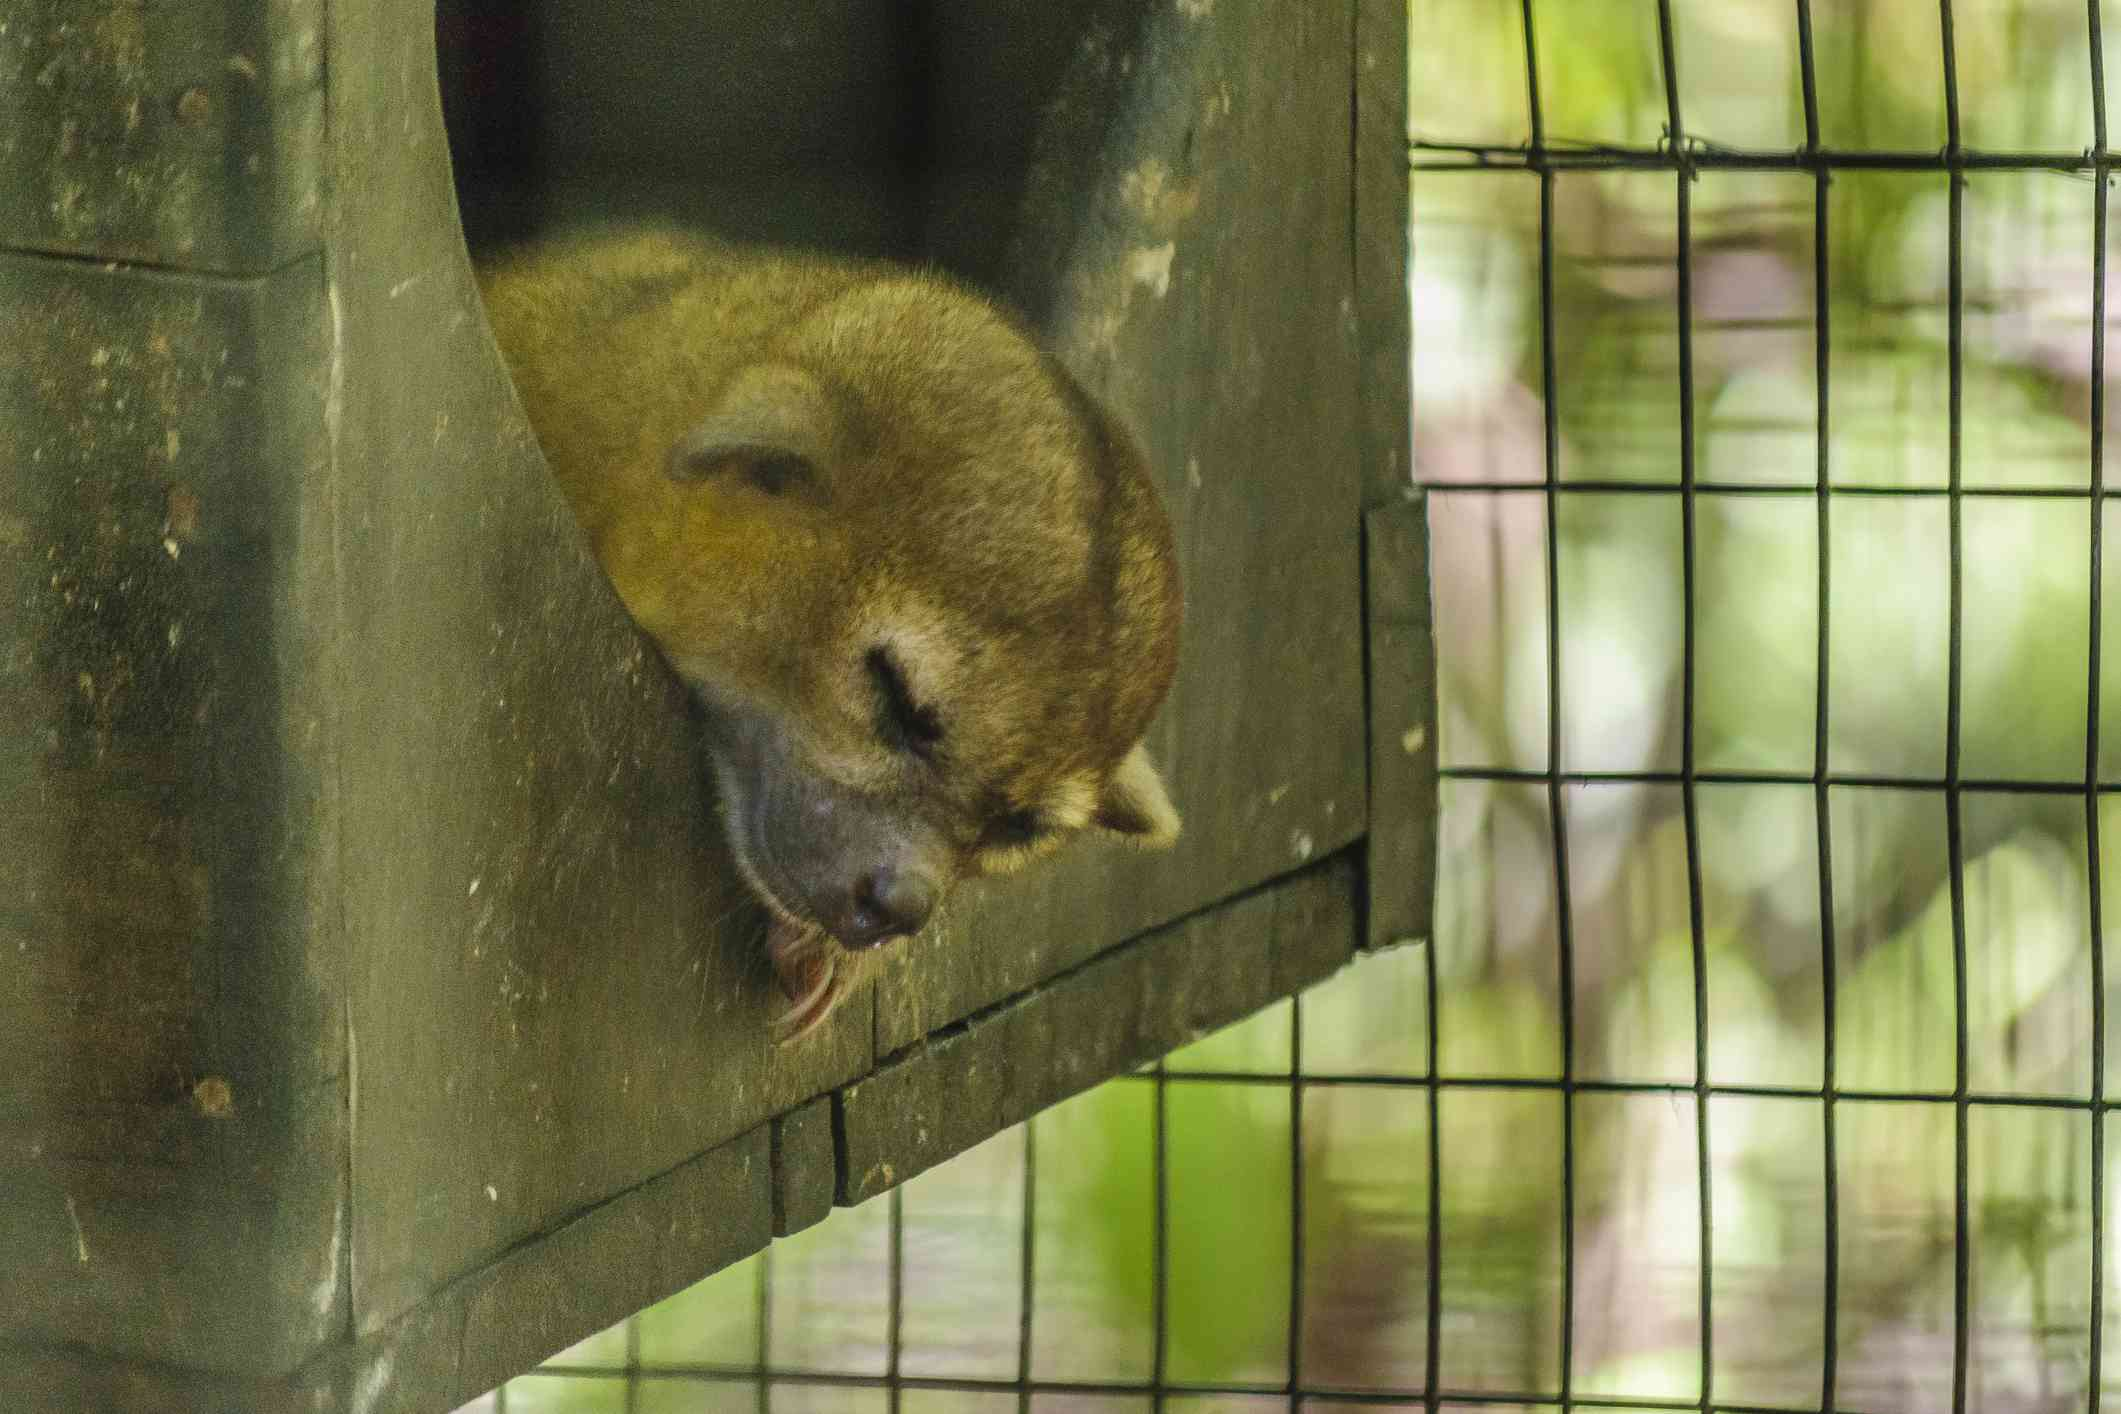 Young sloth at historic park in Guayaqui, Ecuador